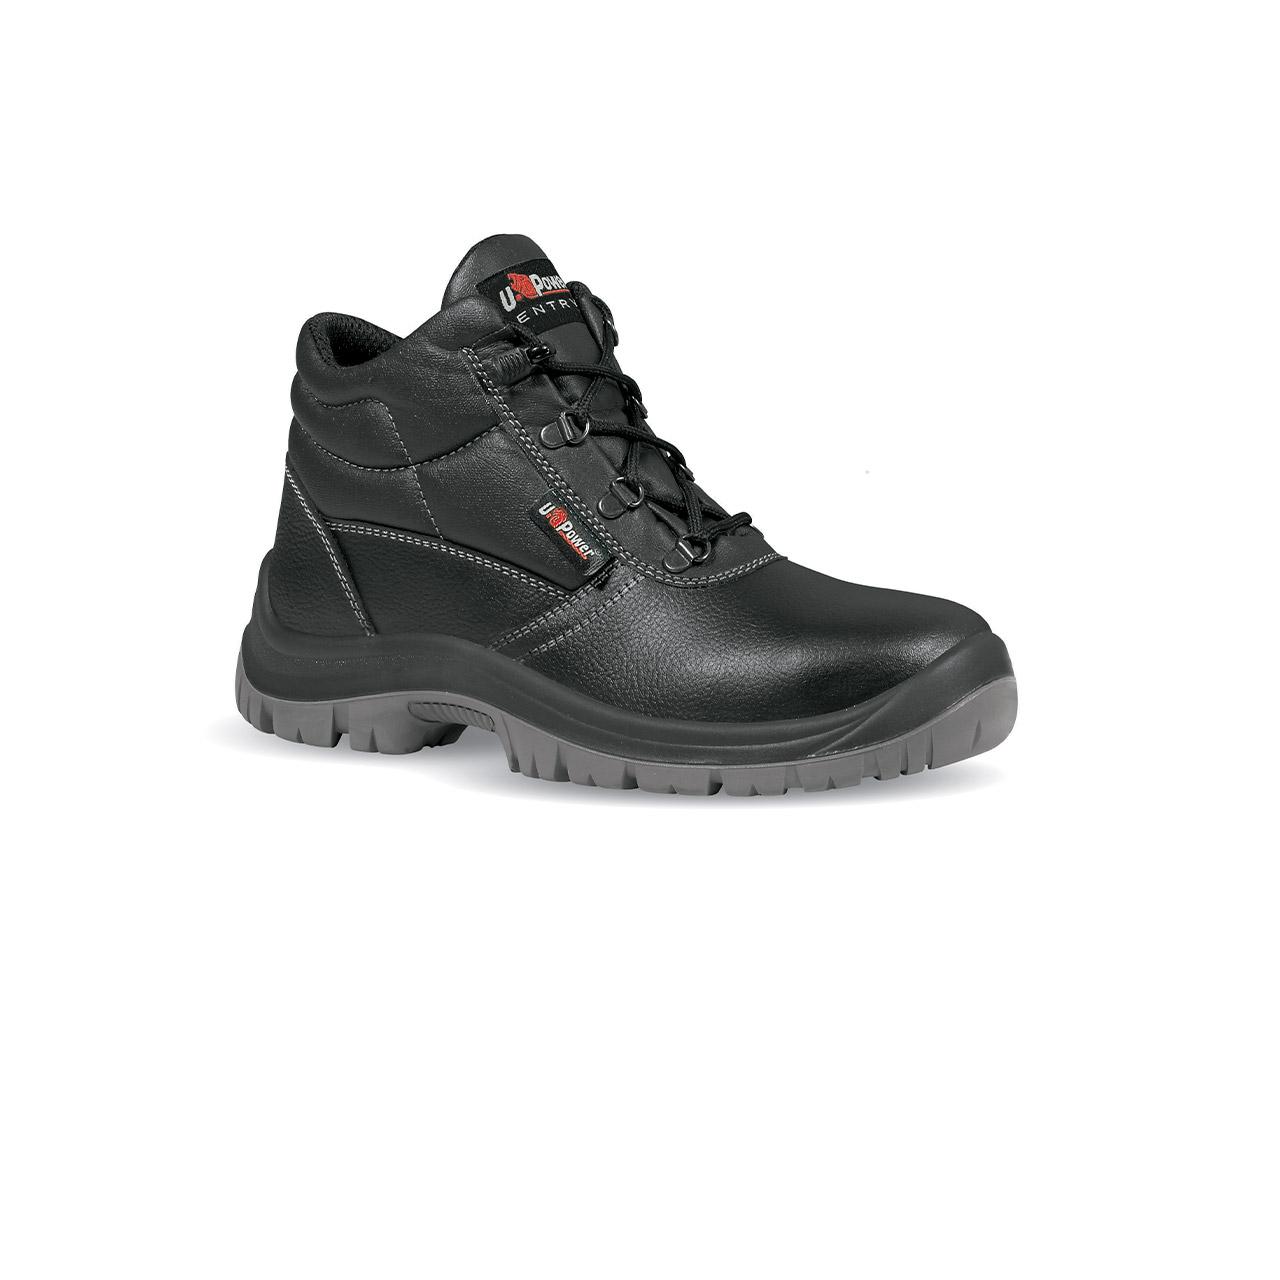 scarpa antinfortunistica upower modello safe linea safe vista laterale